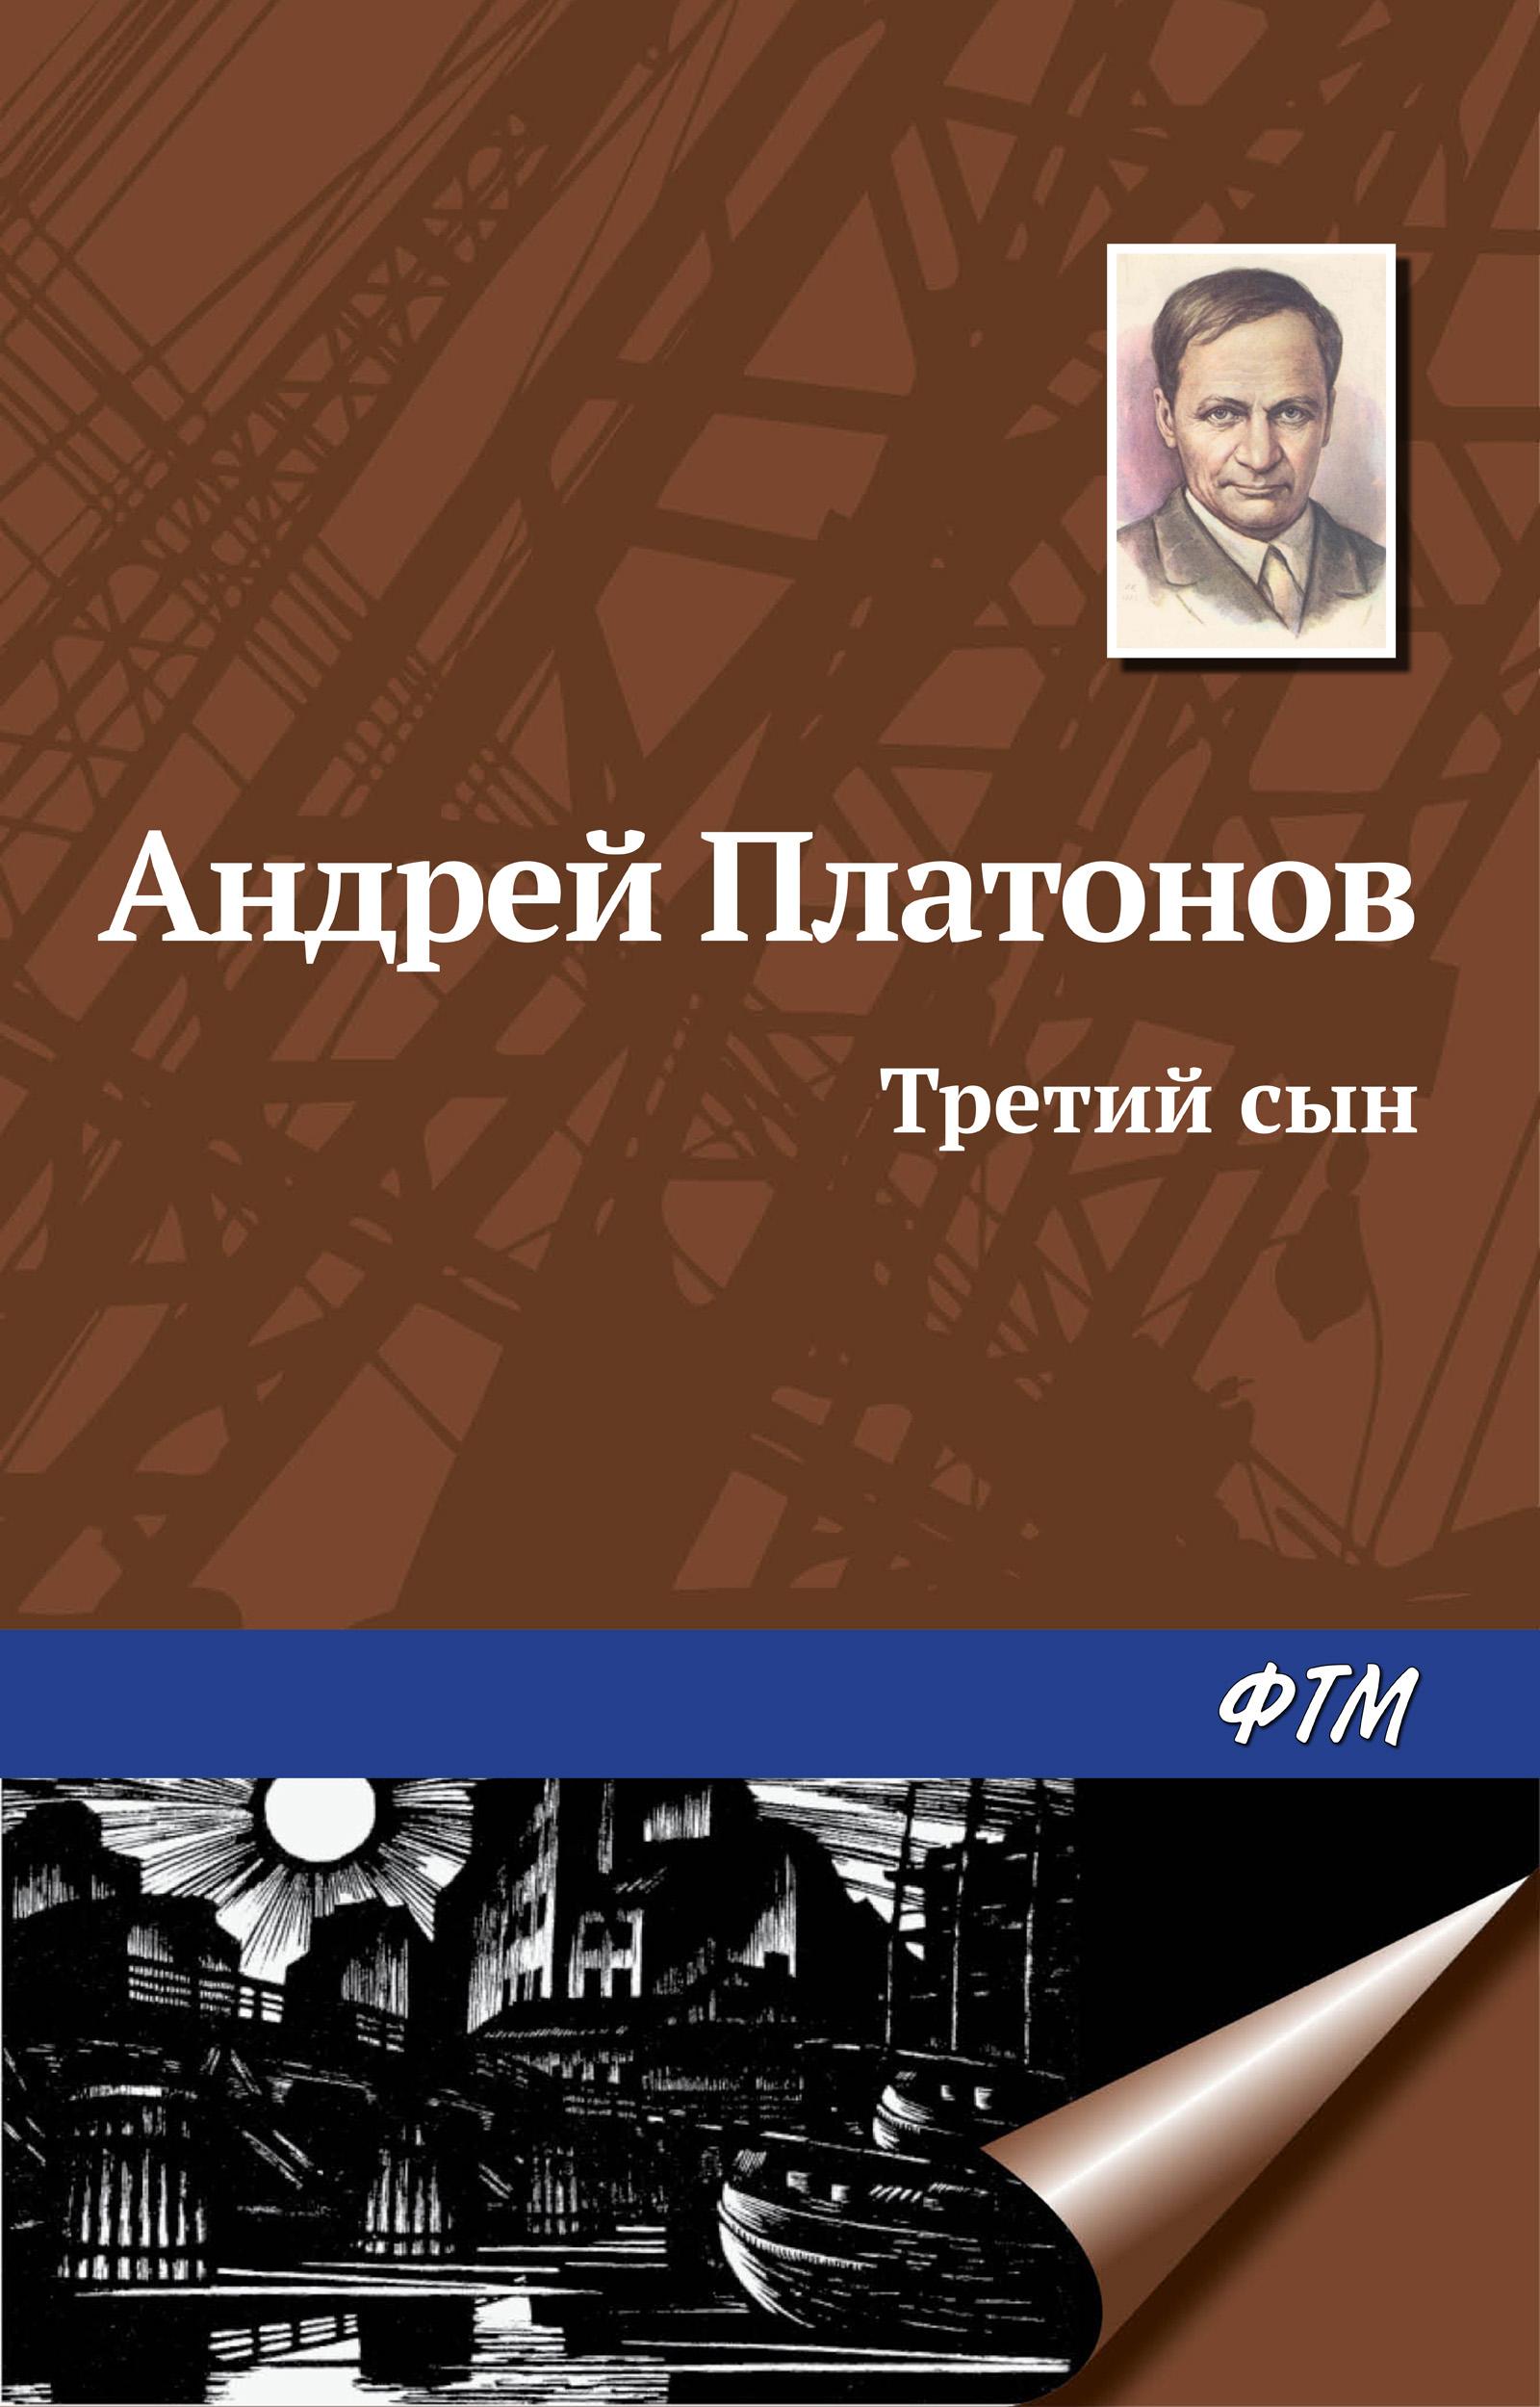 Андрей Платонов Третий сын